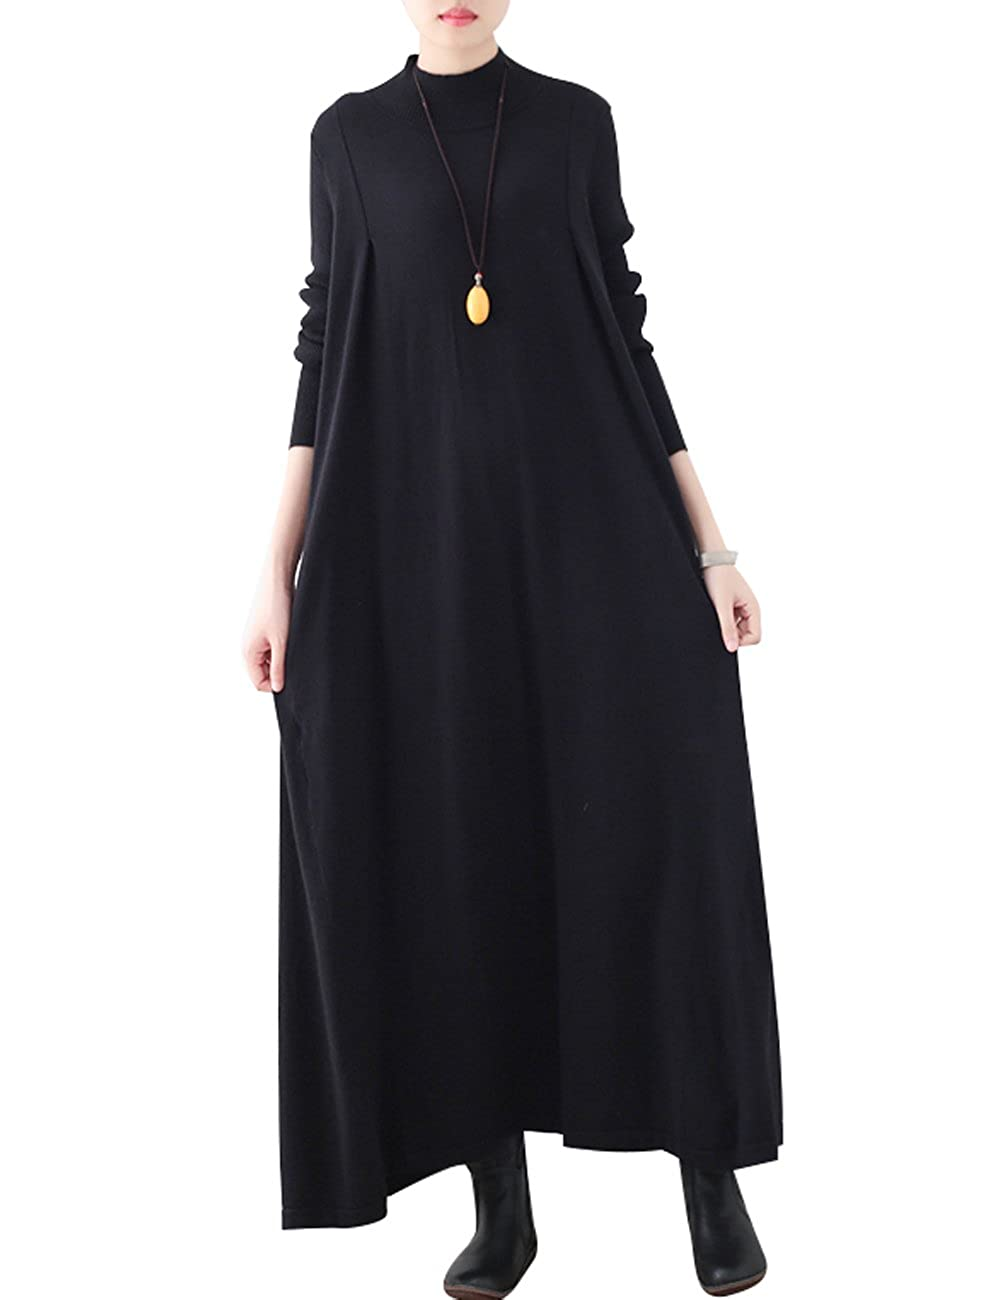 Black Zoulee Women Turtleneck Long Sleeve Maxi Knit Sweater Dress